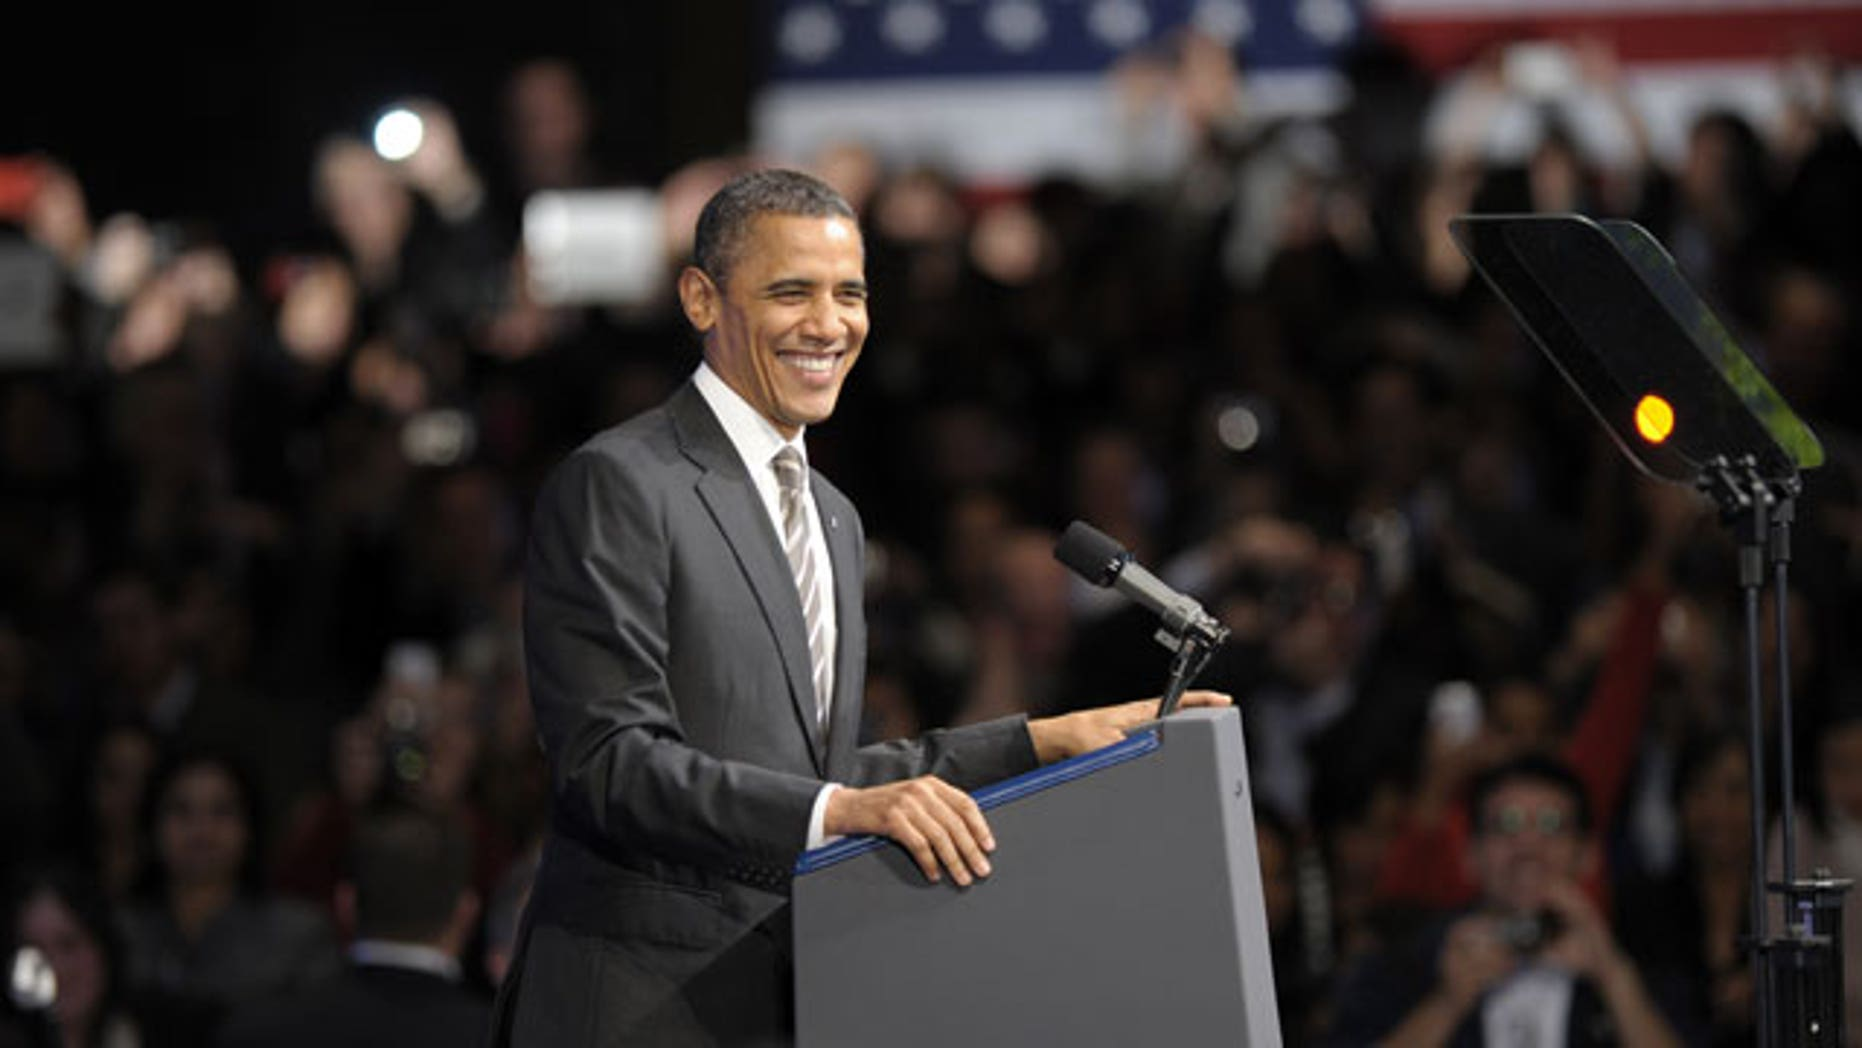 Feb. 16, 2012: President Barack Obama speaks at the Nob Hill Masonic Center in San Francisco.